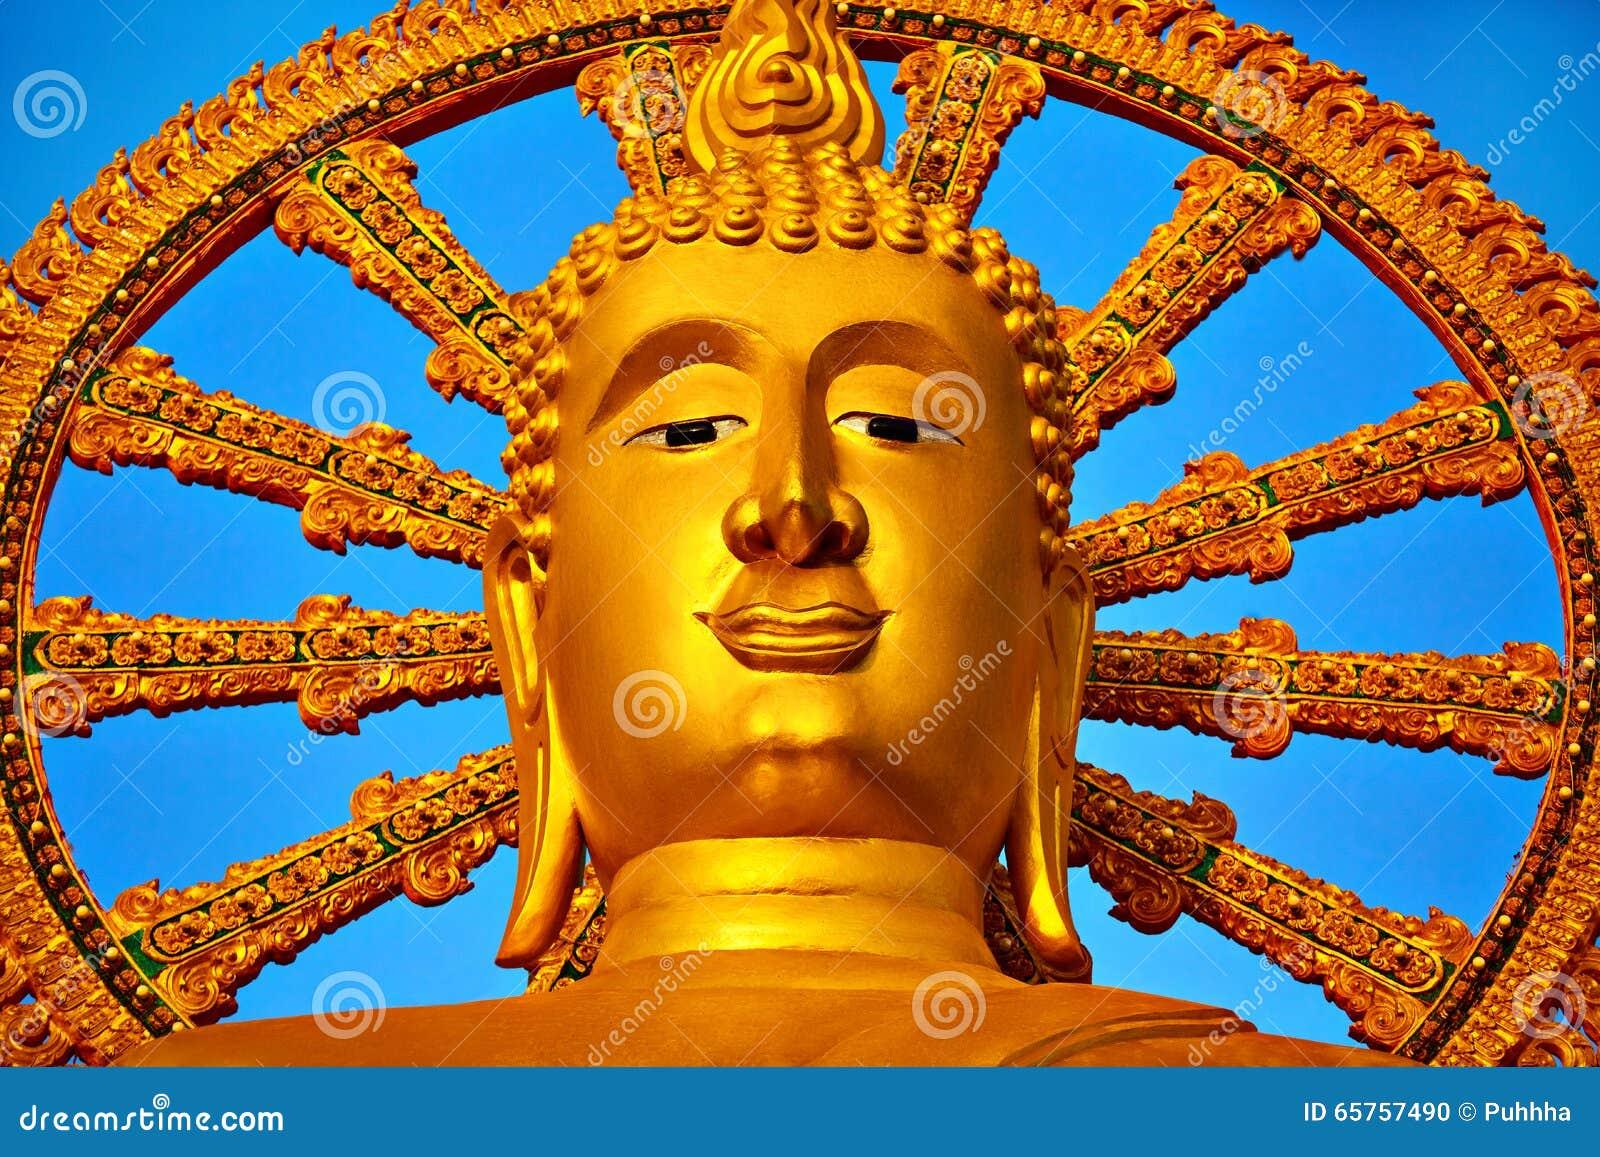 Spirituality Gouden Boedha, Wat Phra Yai Temple, Thailand Reli